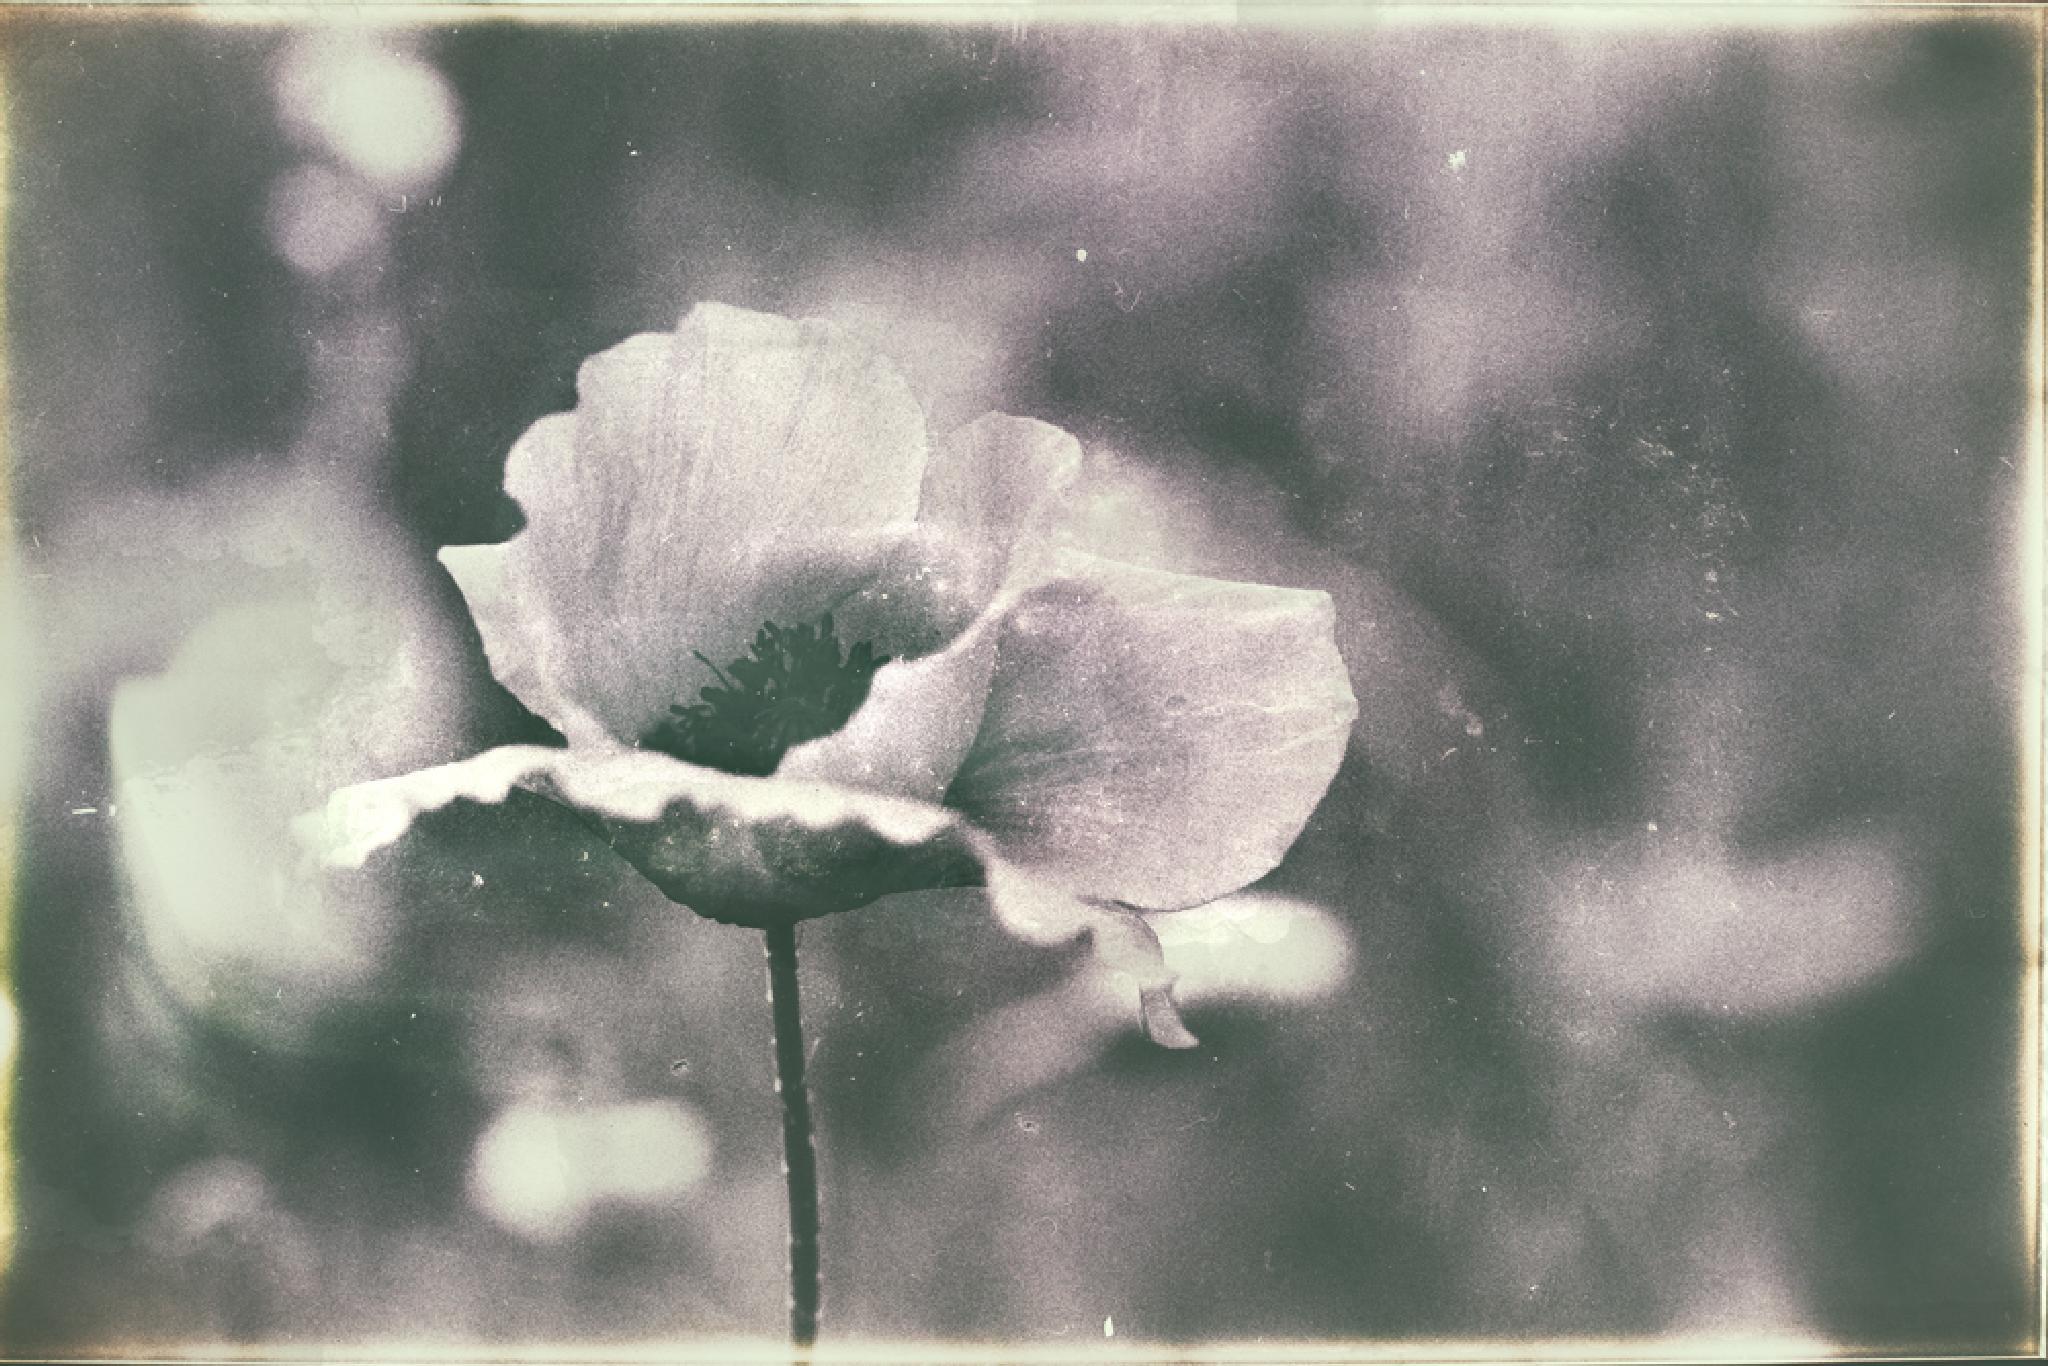 Surreal poppy by Zsoka Lorincz